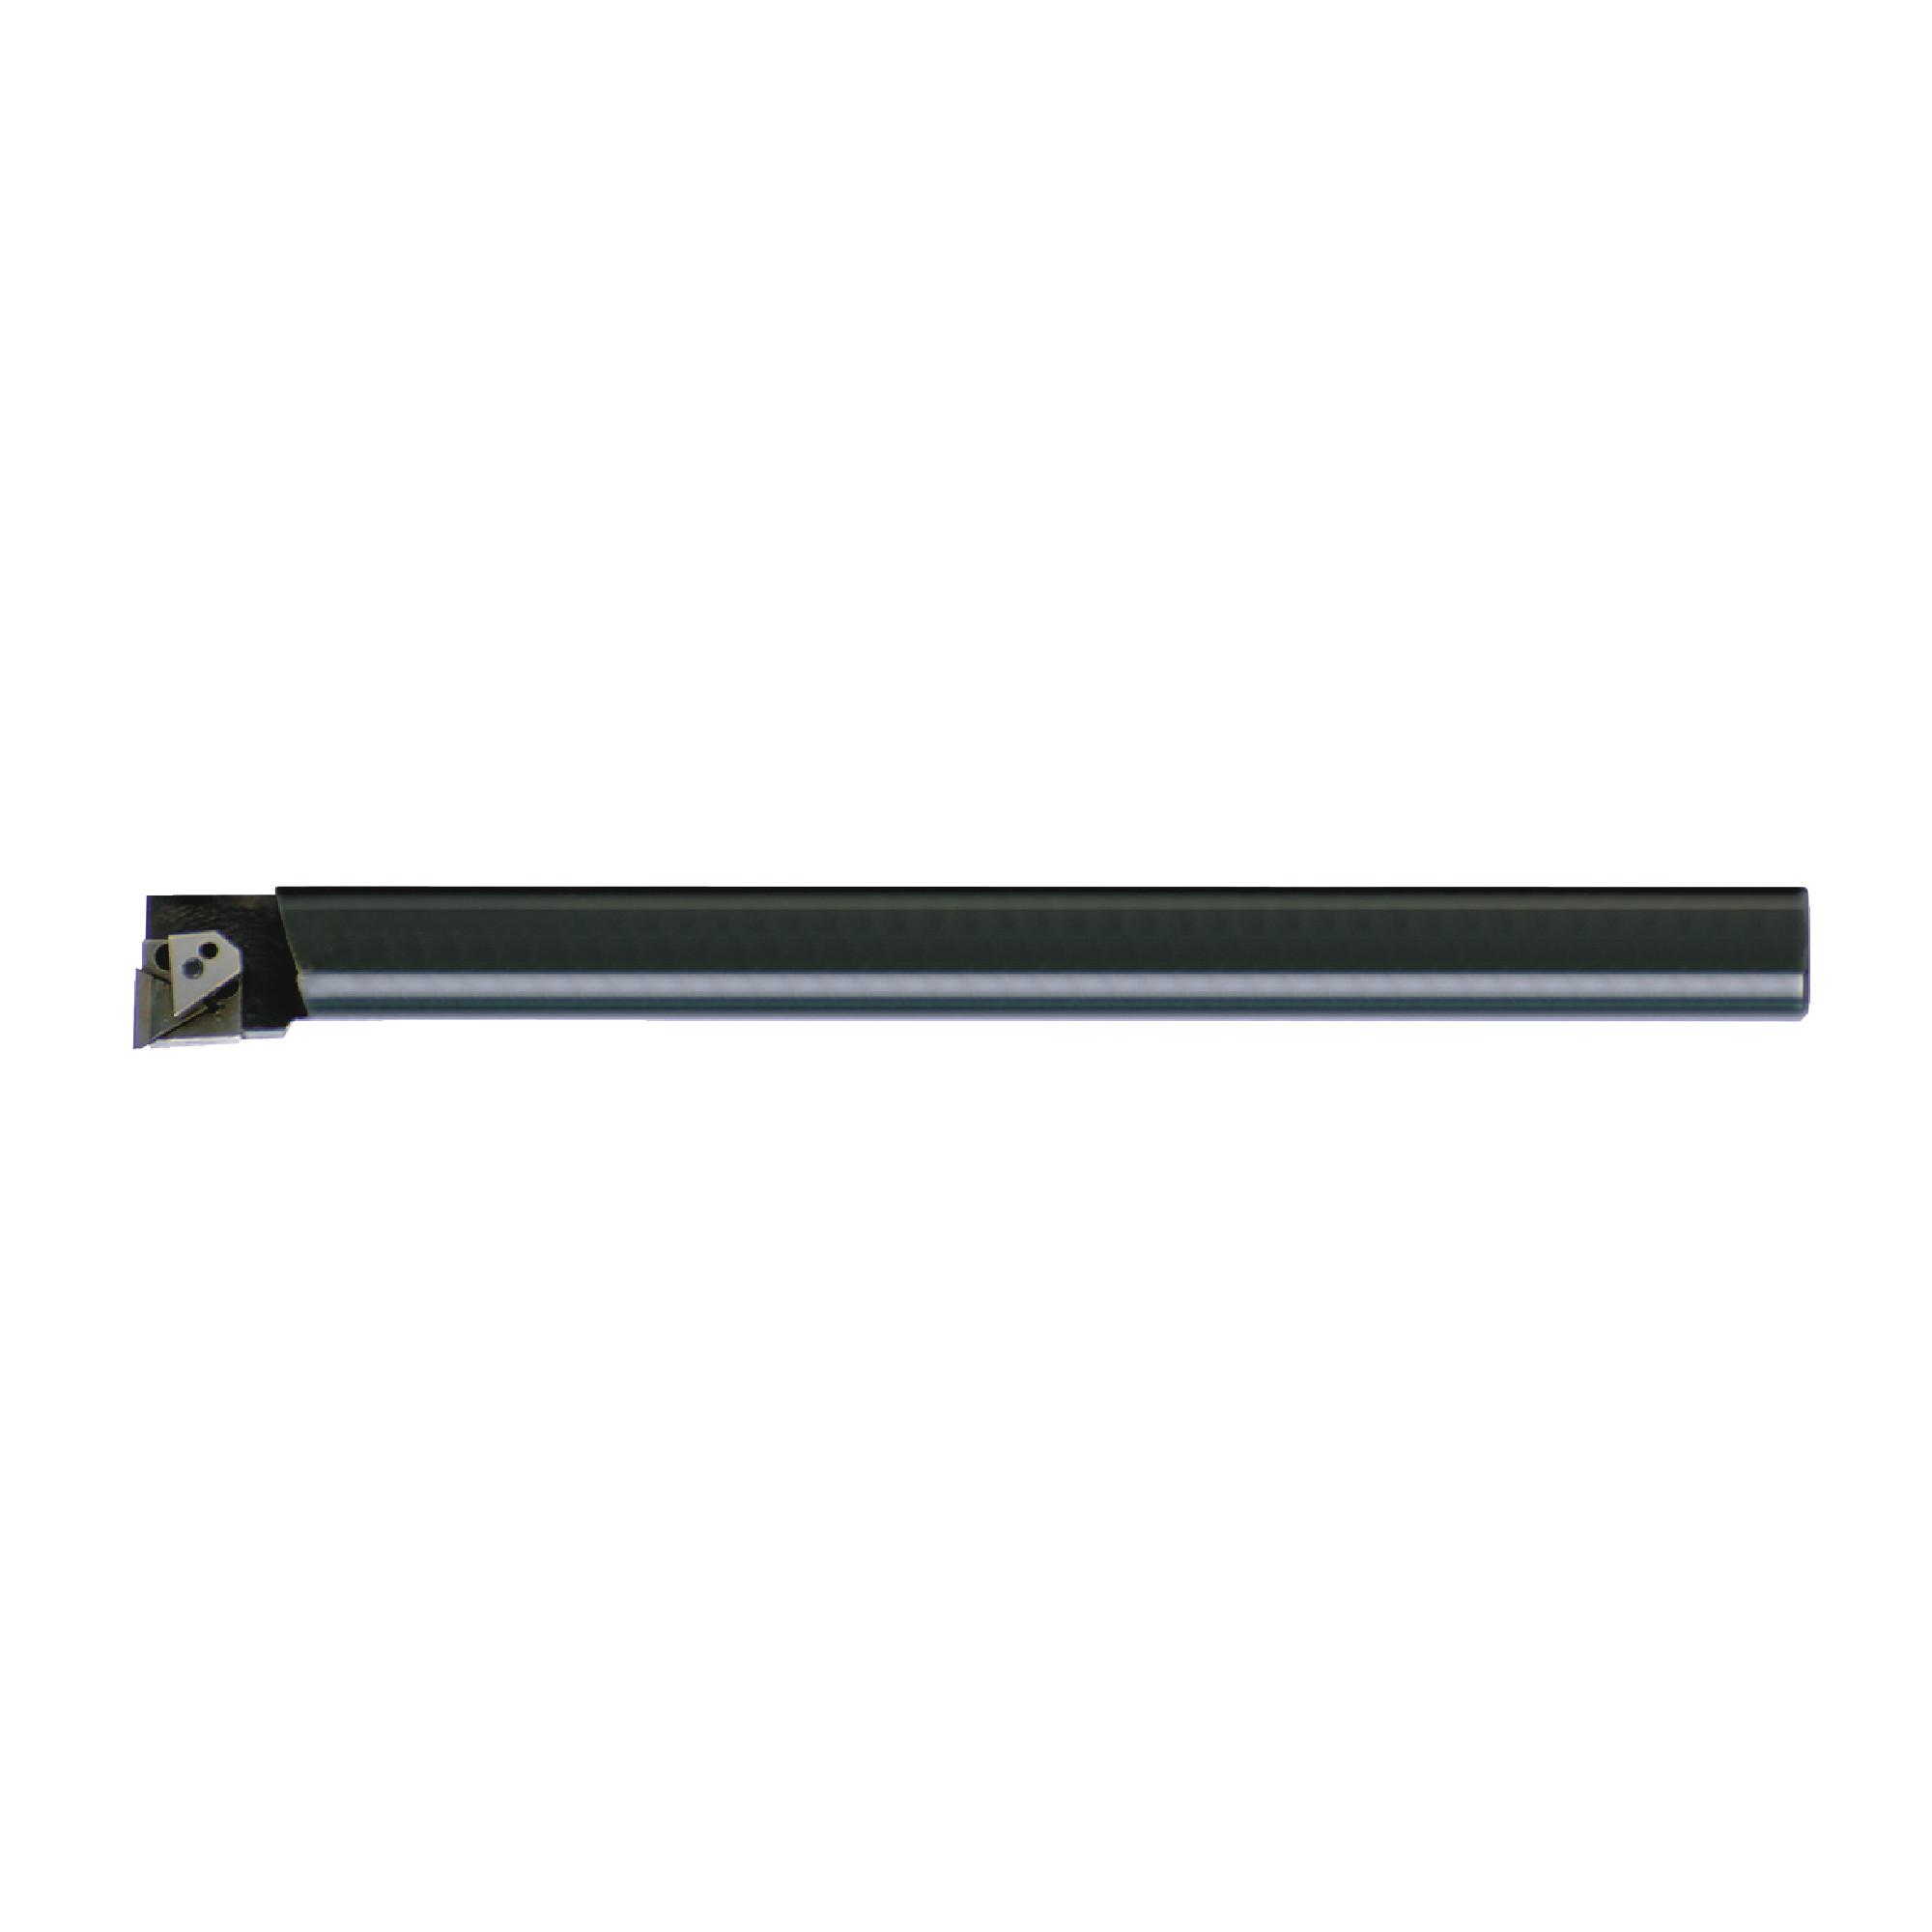 "APT - TL105 Boring Bar / 1.0"" Shank / 5.0"" Overall Length / TPG32_ / Right Hand"